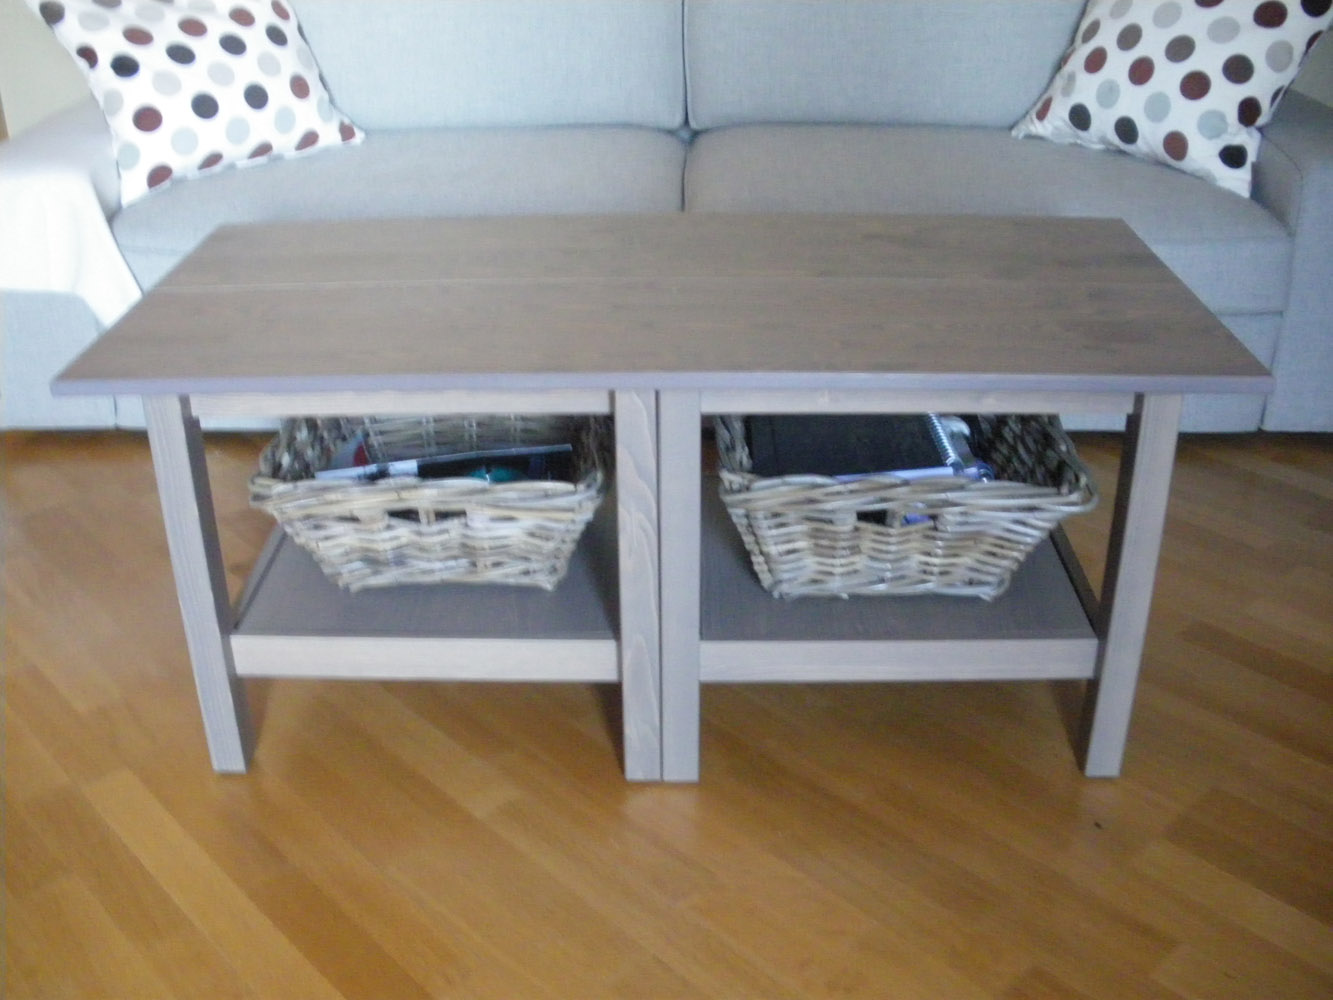 Ikea hack la mesa de centro hemnes con baldas ekby como for Mesa salon ikea